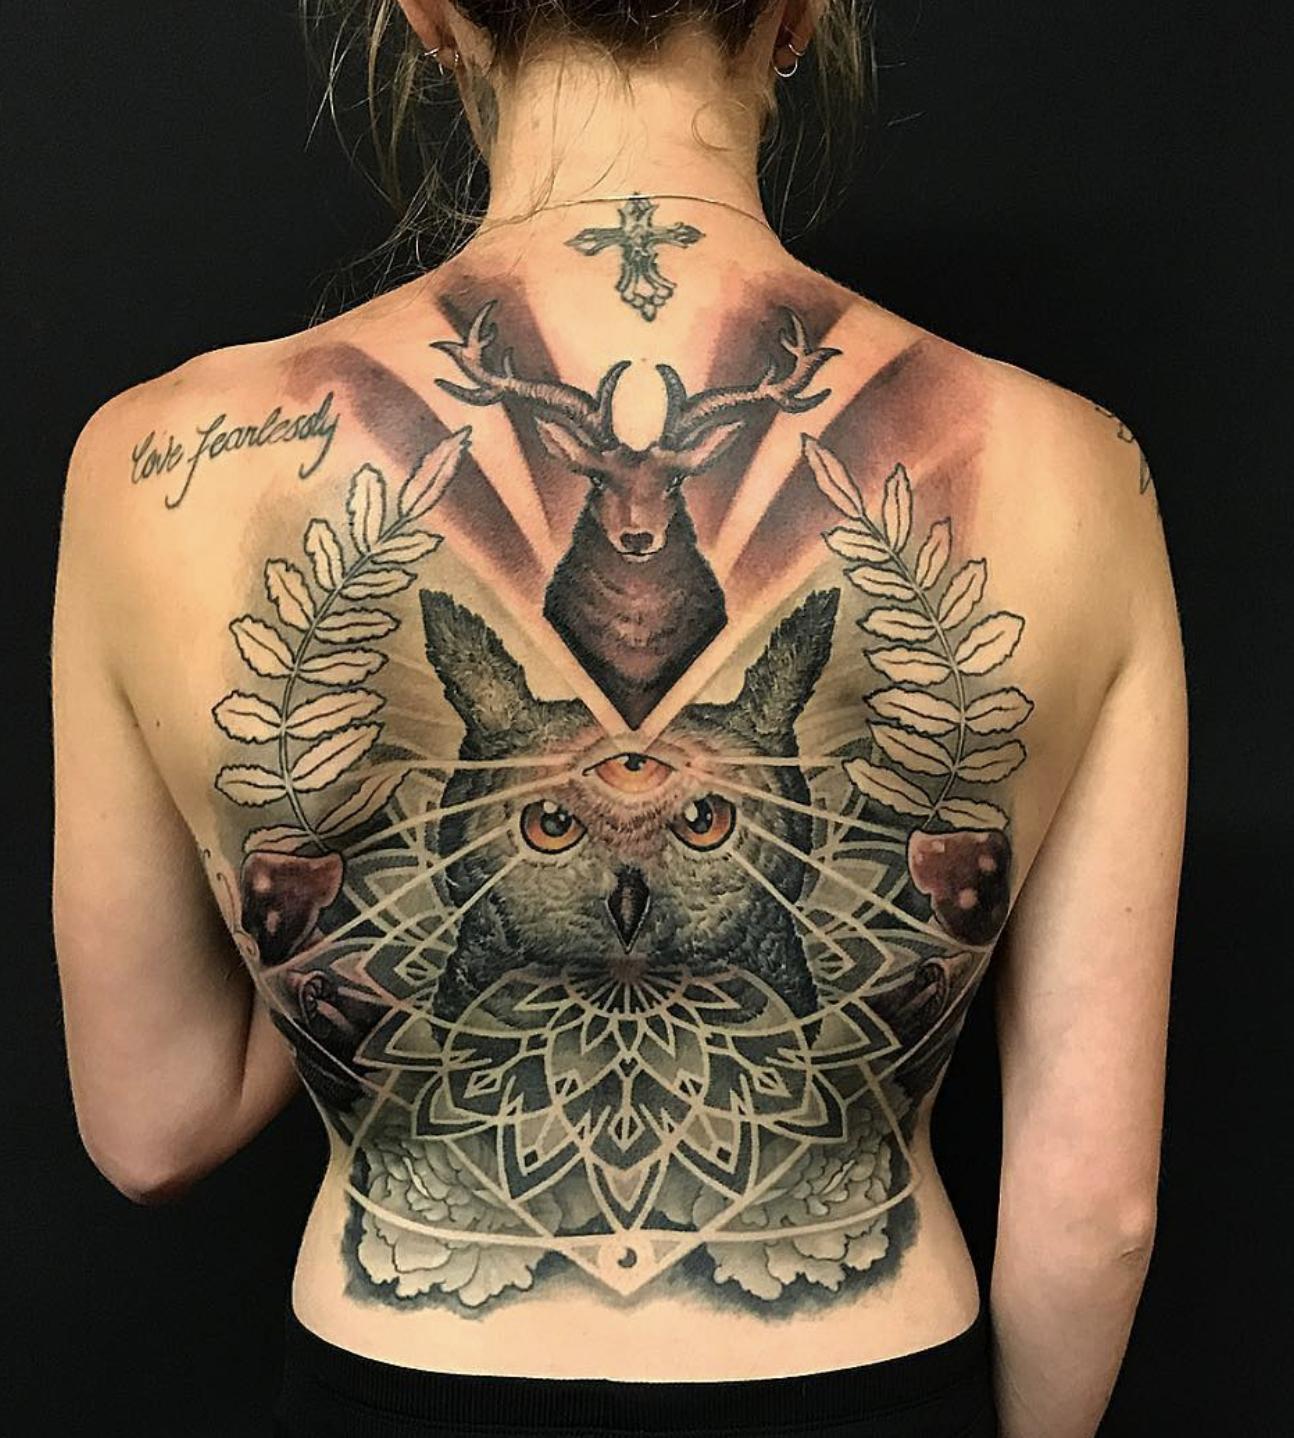 Cory Boersma - The Artful Dodger Tattoo & Comics